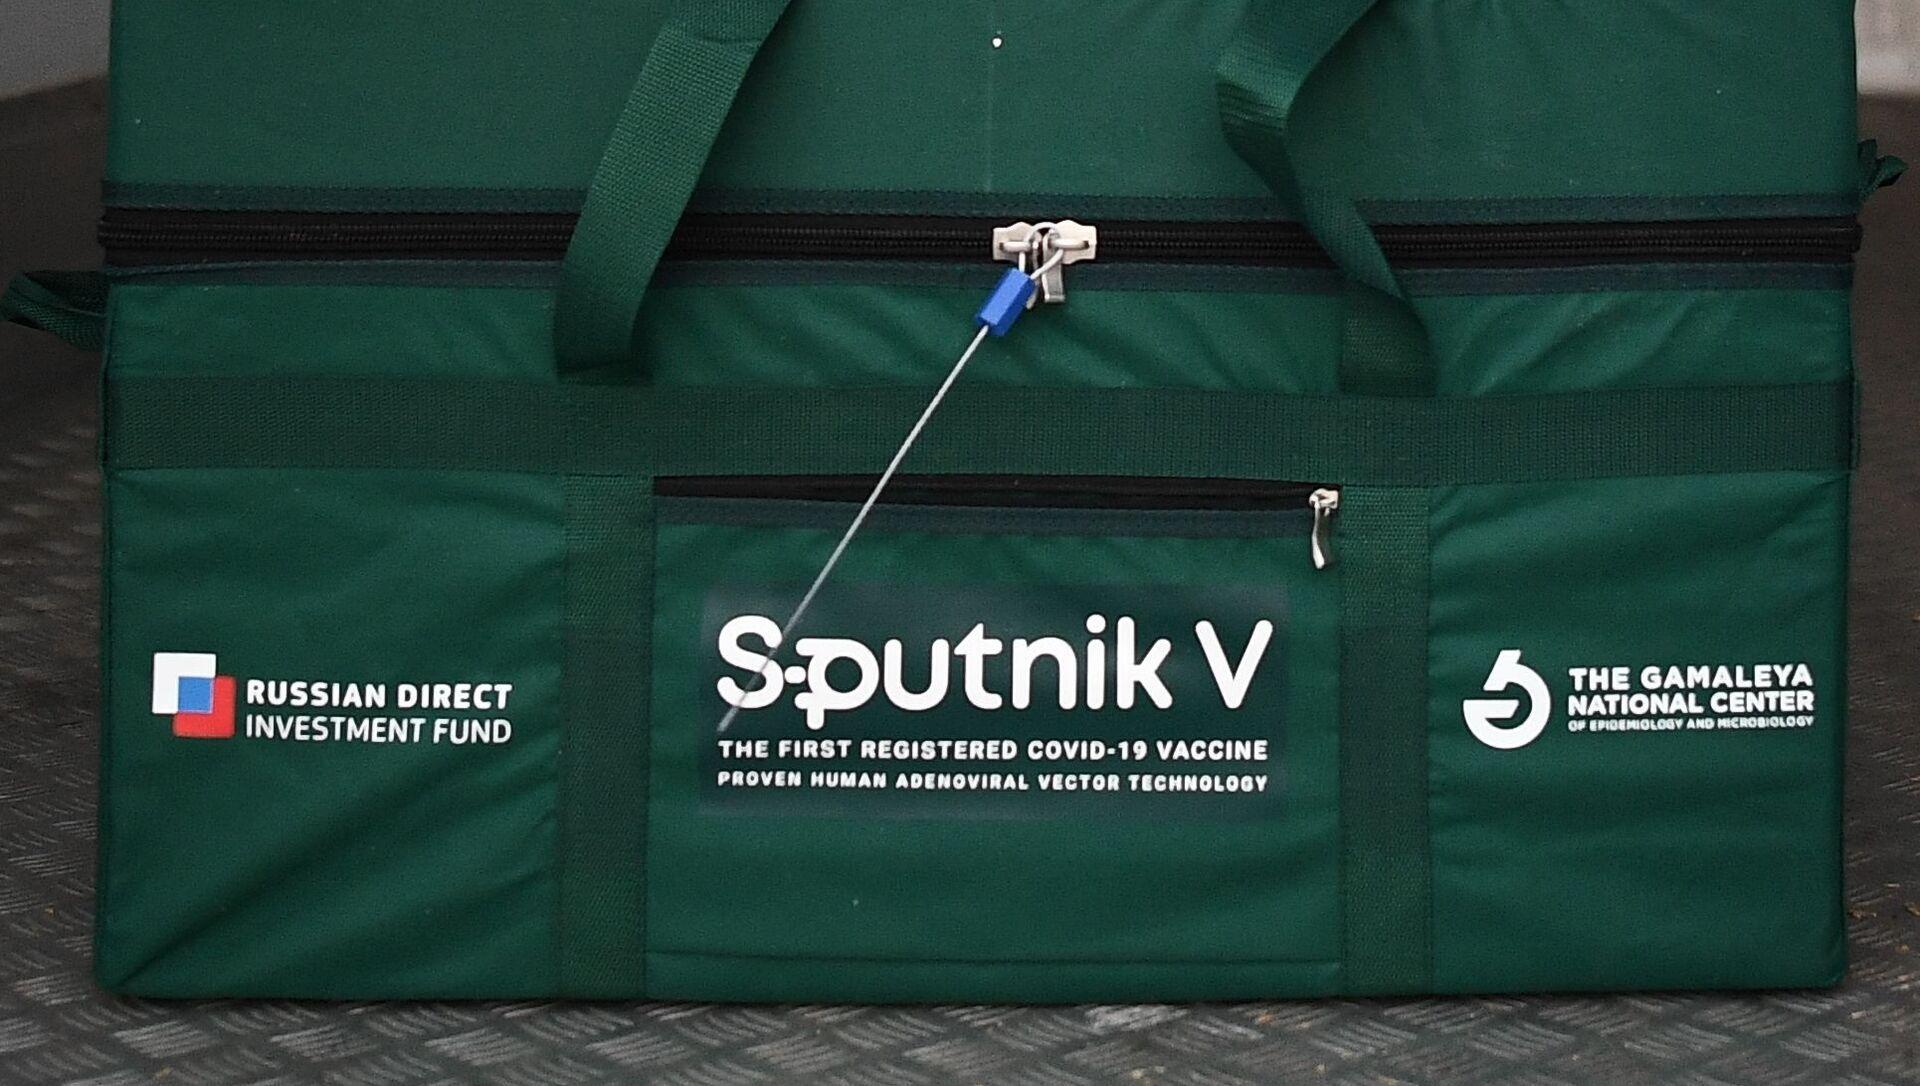 Un contenedor con la vacuna contra el coronavirus Sputnik V - Sputnik Mundo, 1920, 03.02.2021